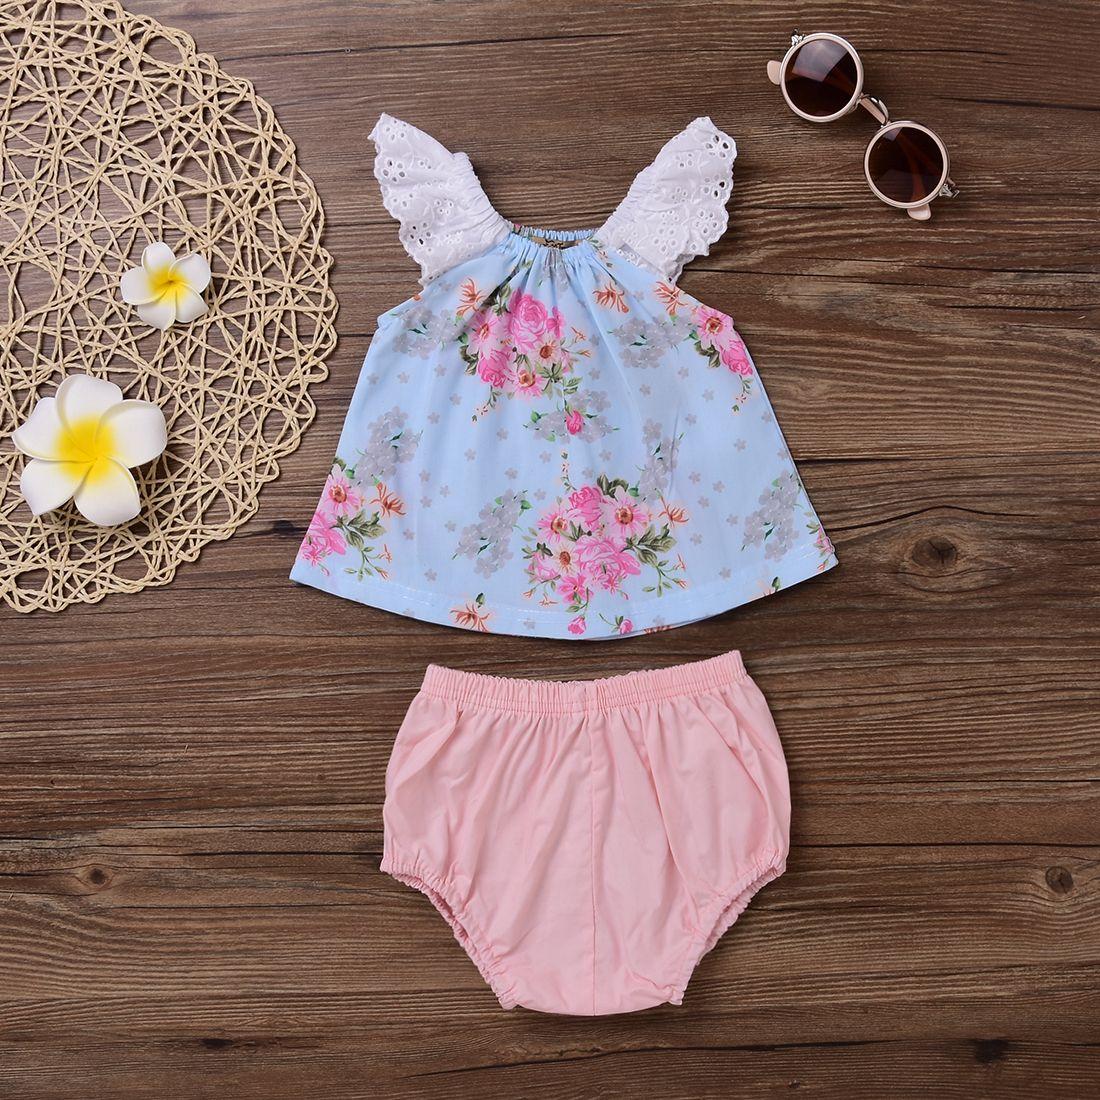 2017 Newest Set Princess Baby Girl Cute Clothes Summer Print Flower Skirt Tops Vest Pink Pants Infant Suit Girls Cotton Christmas Toddler